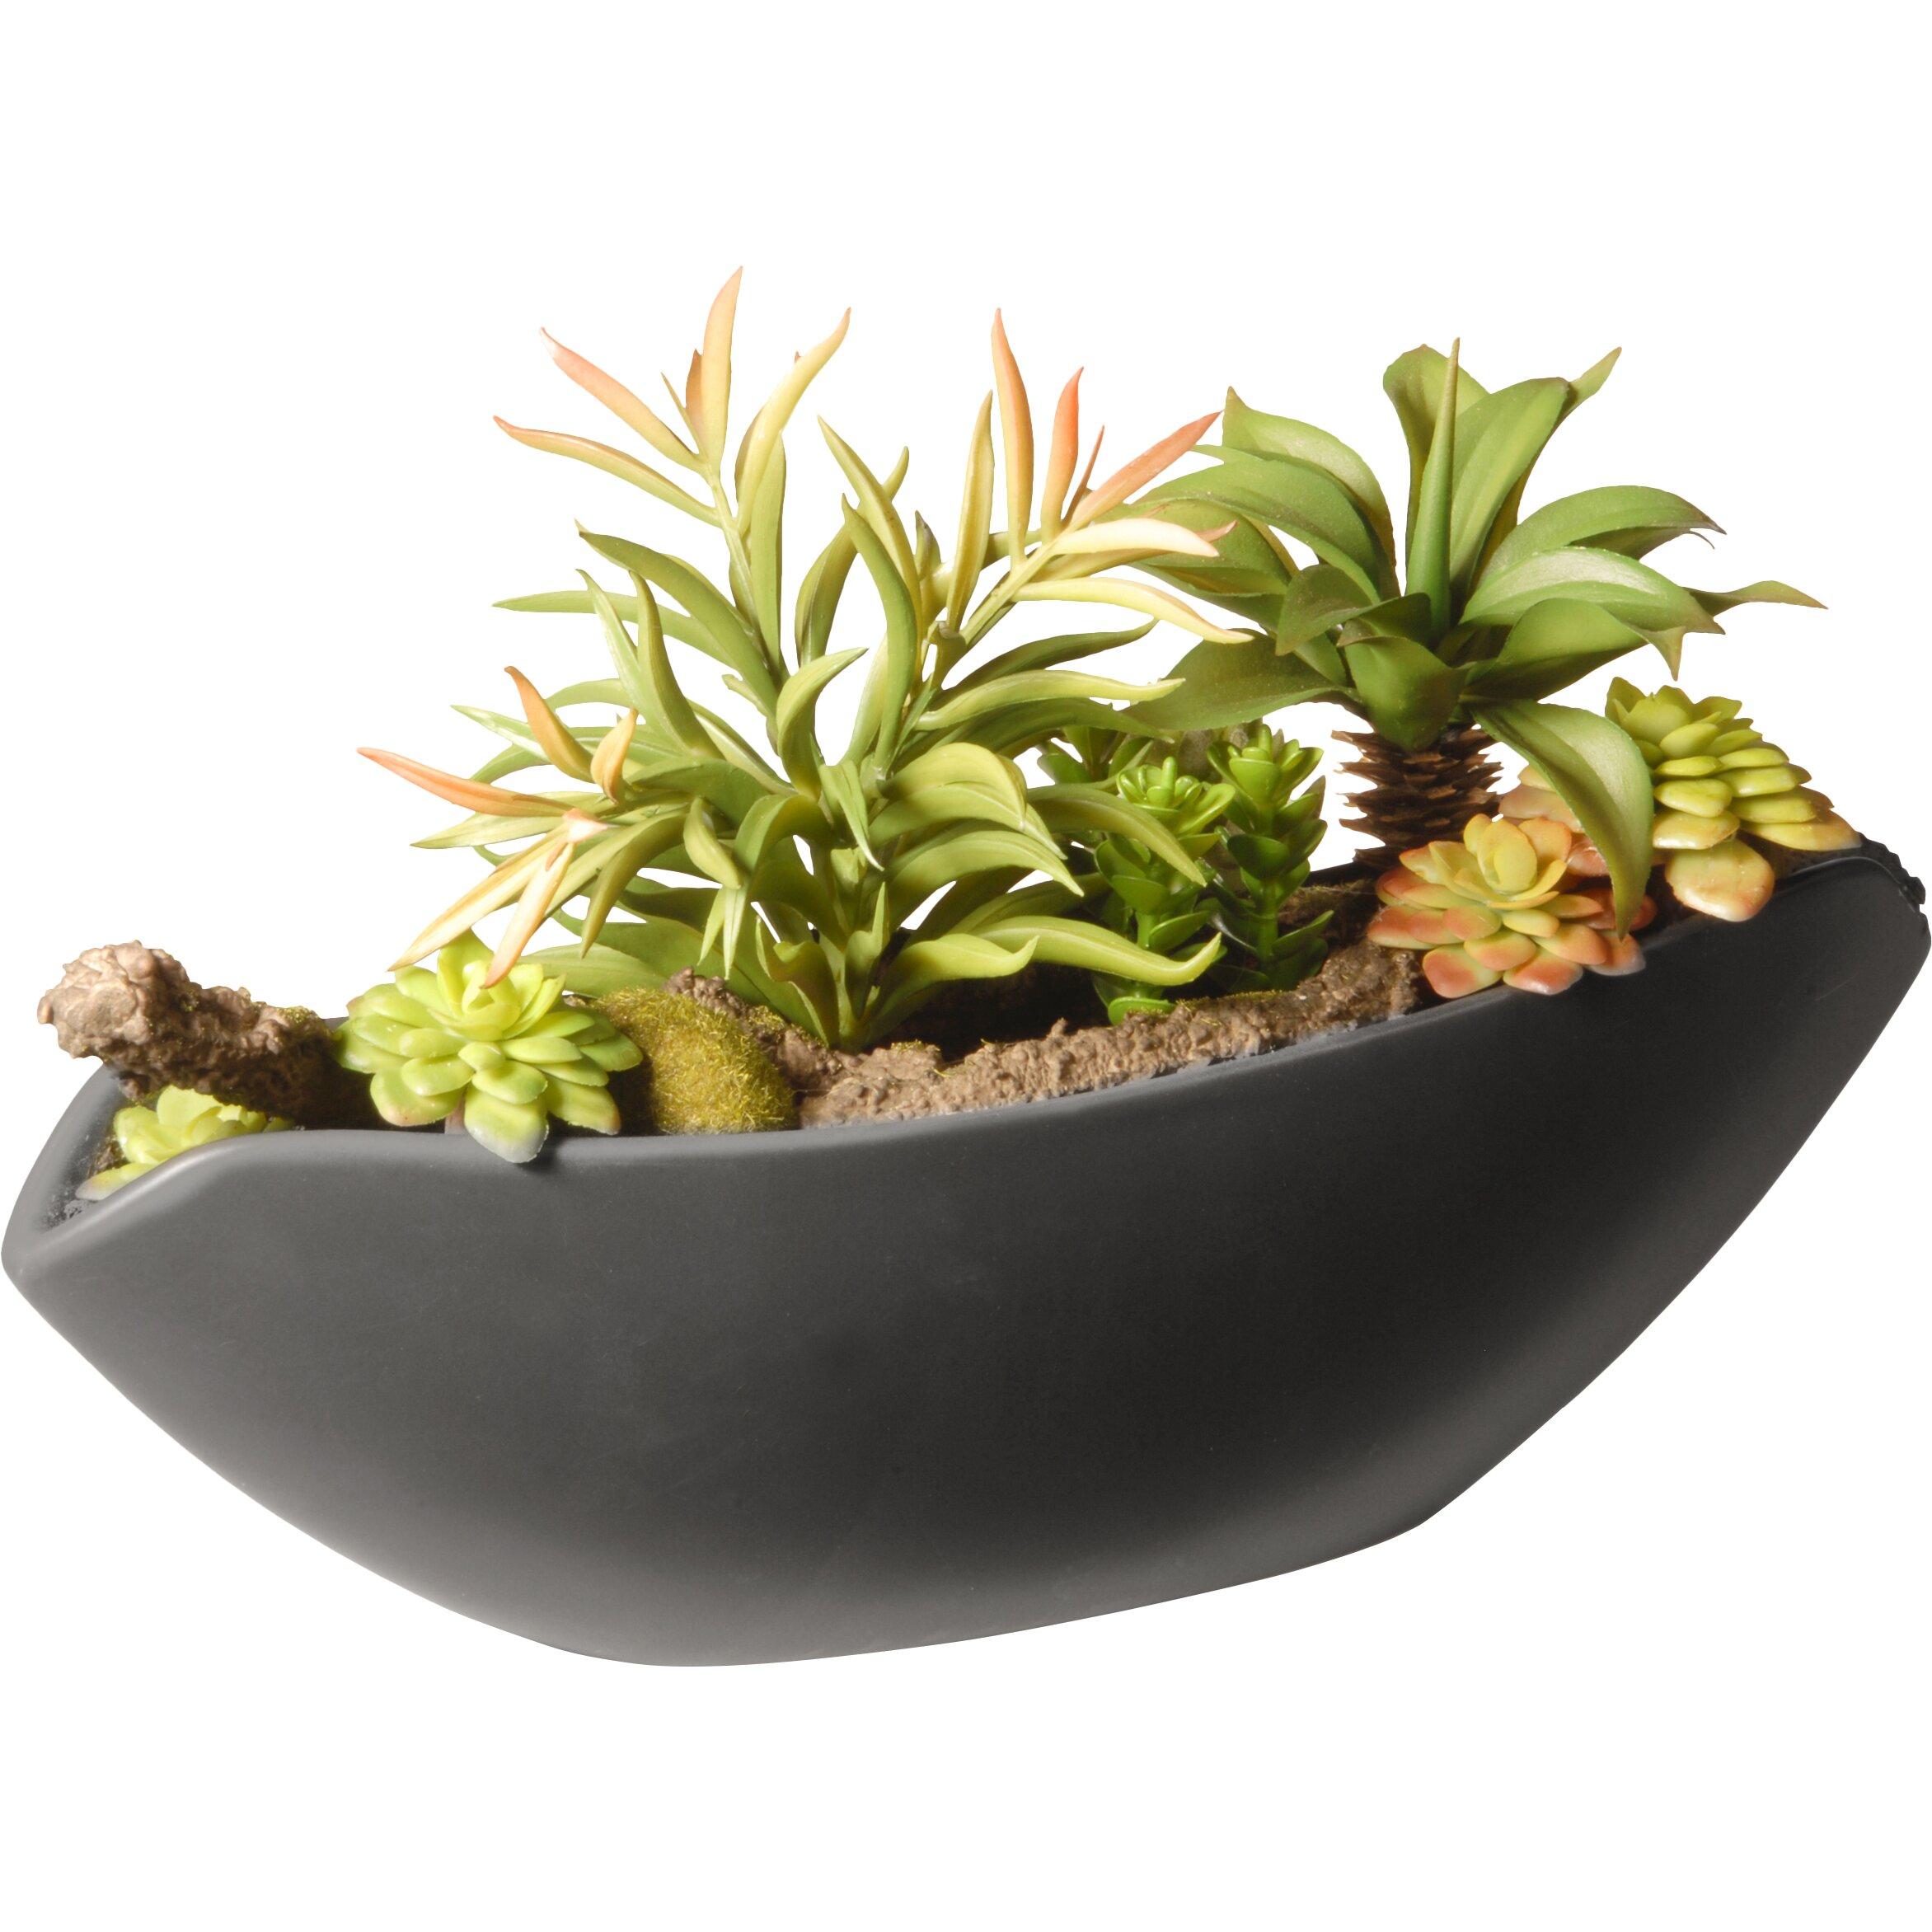 National Tree Co Succulent Desk Top Plant In Pot